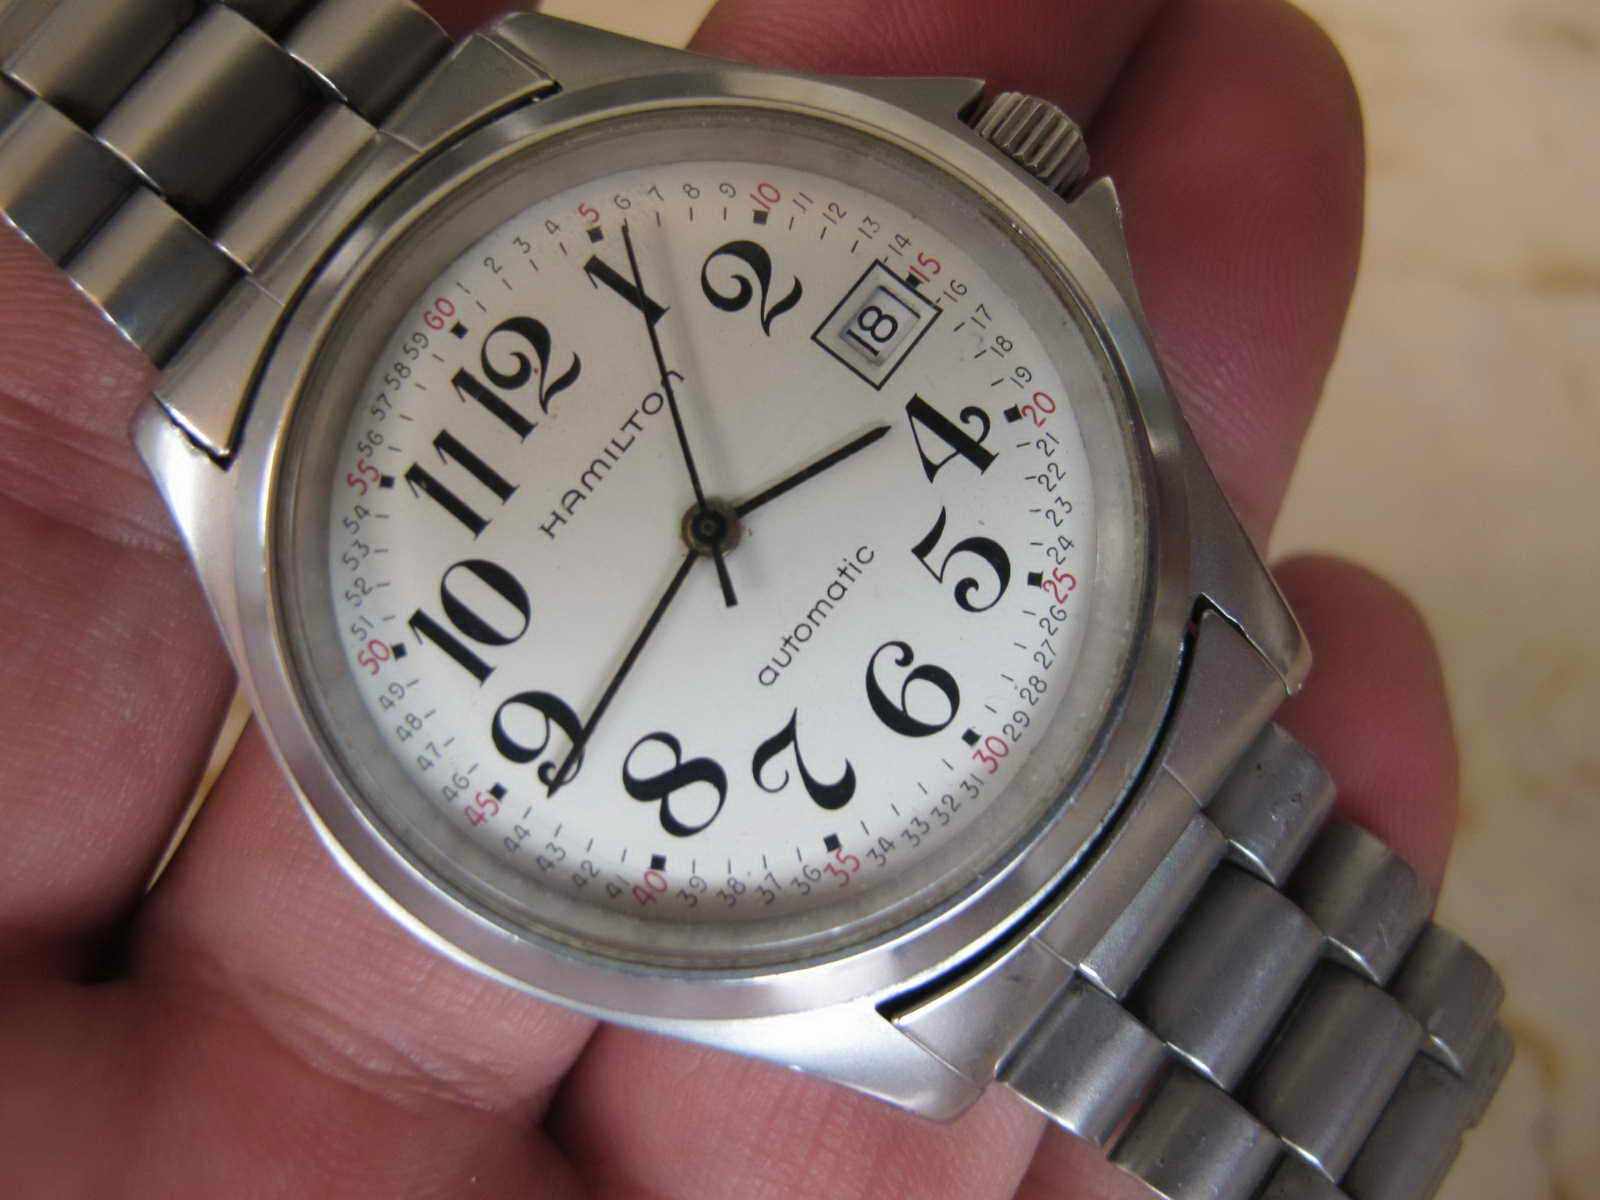 Cocok untuk Anda yang sedang mencari jam tangan dengan dial bersih putih  ... Military style italic index... Automatic HAMILTON. f284f6d220